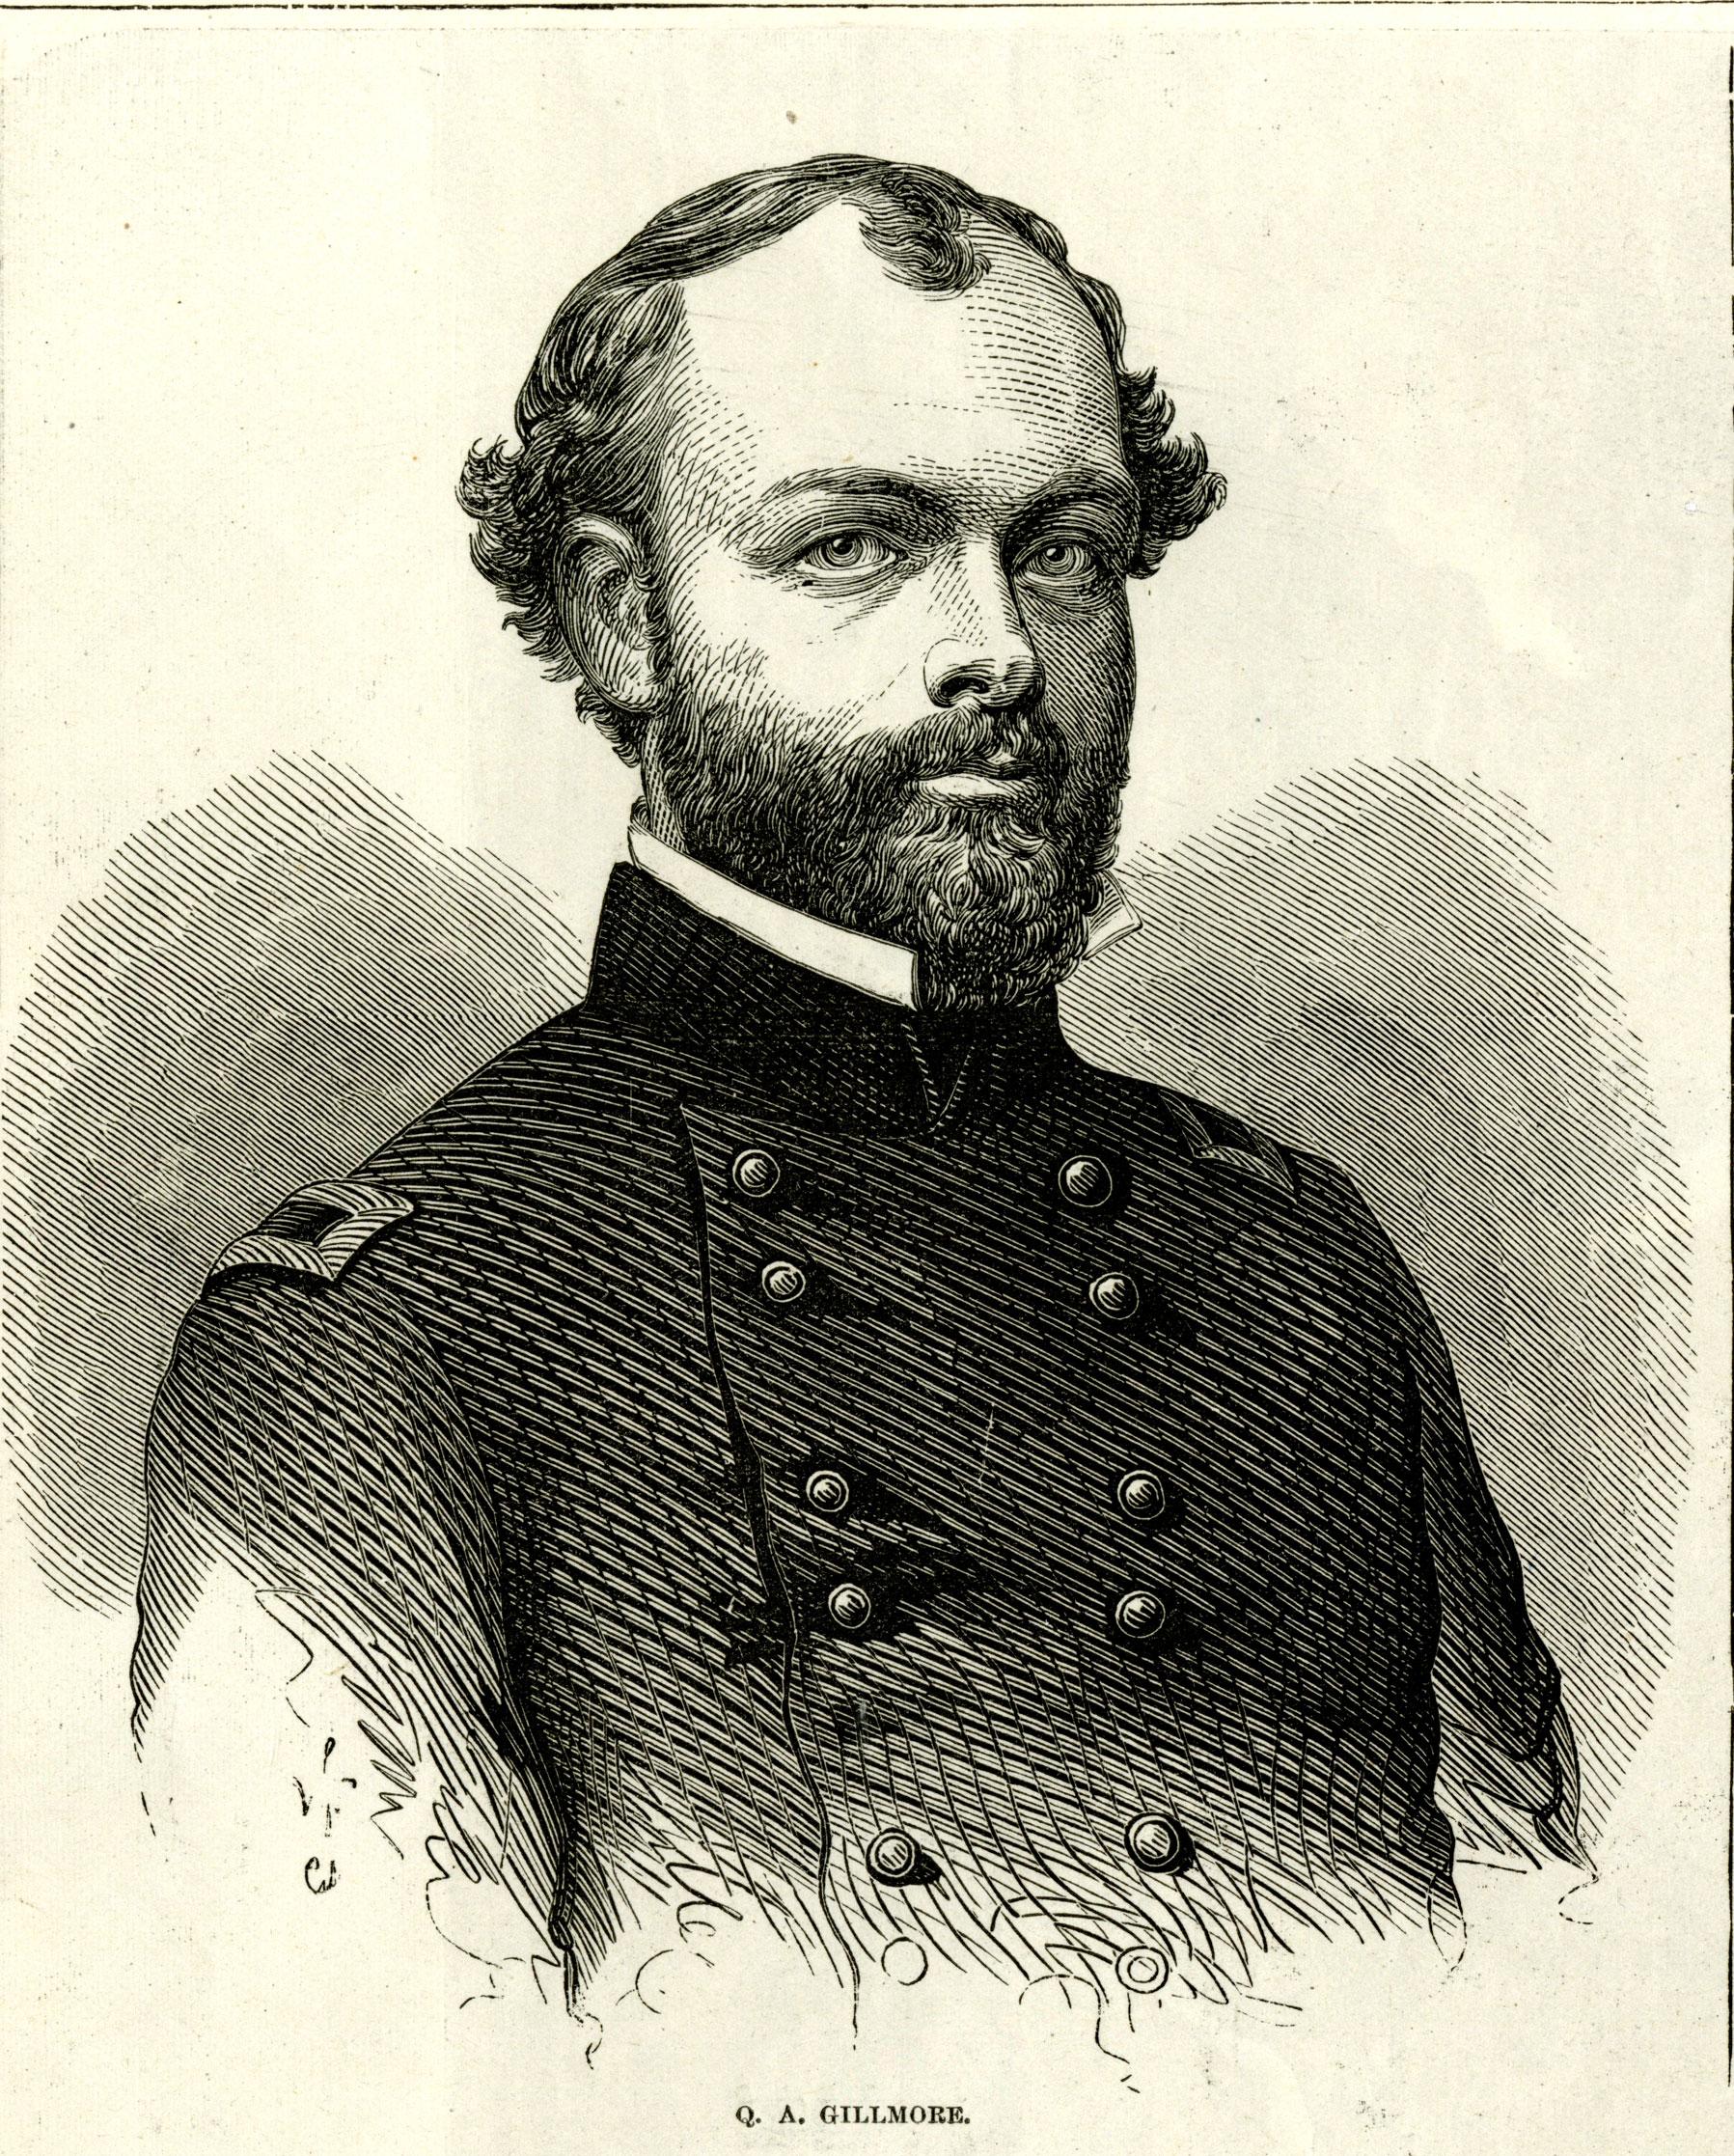 Harper's History of the Great Rebellion